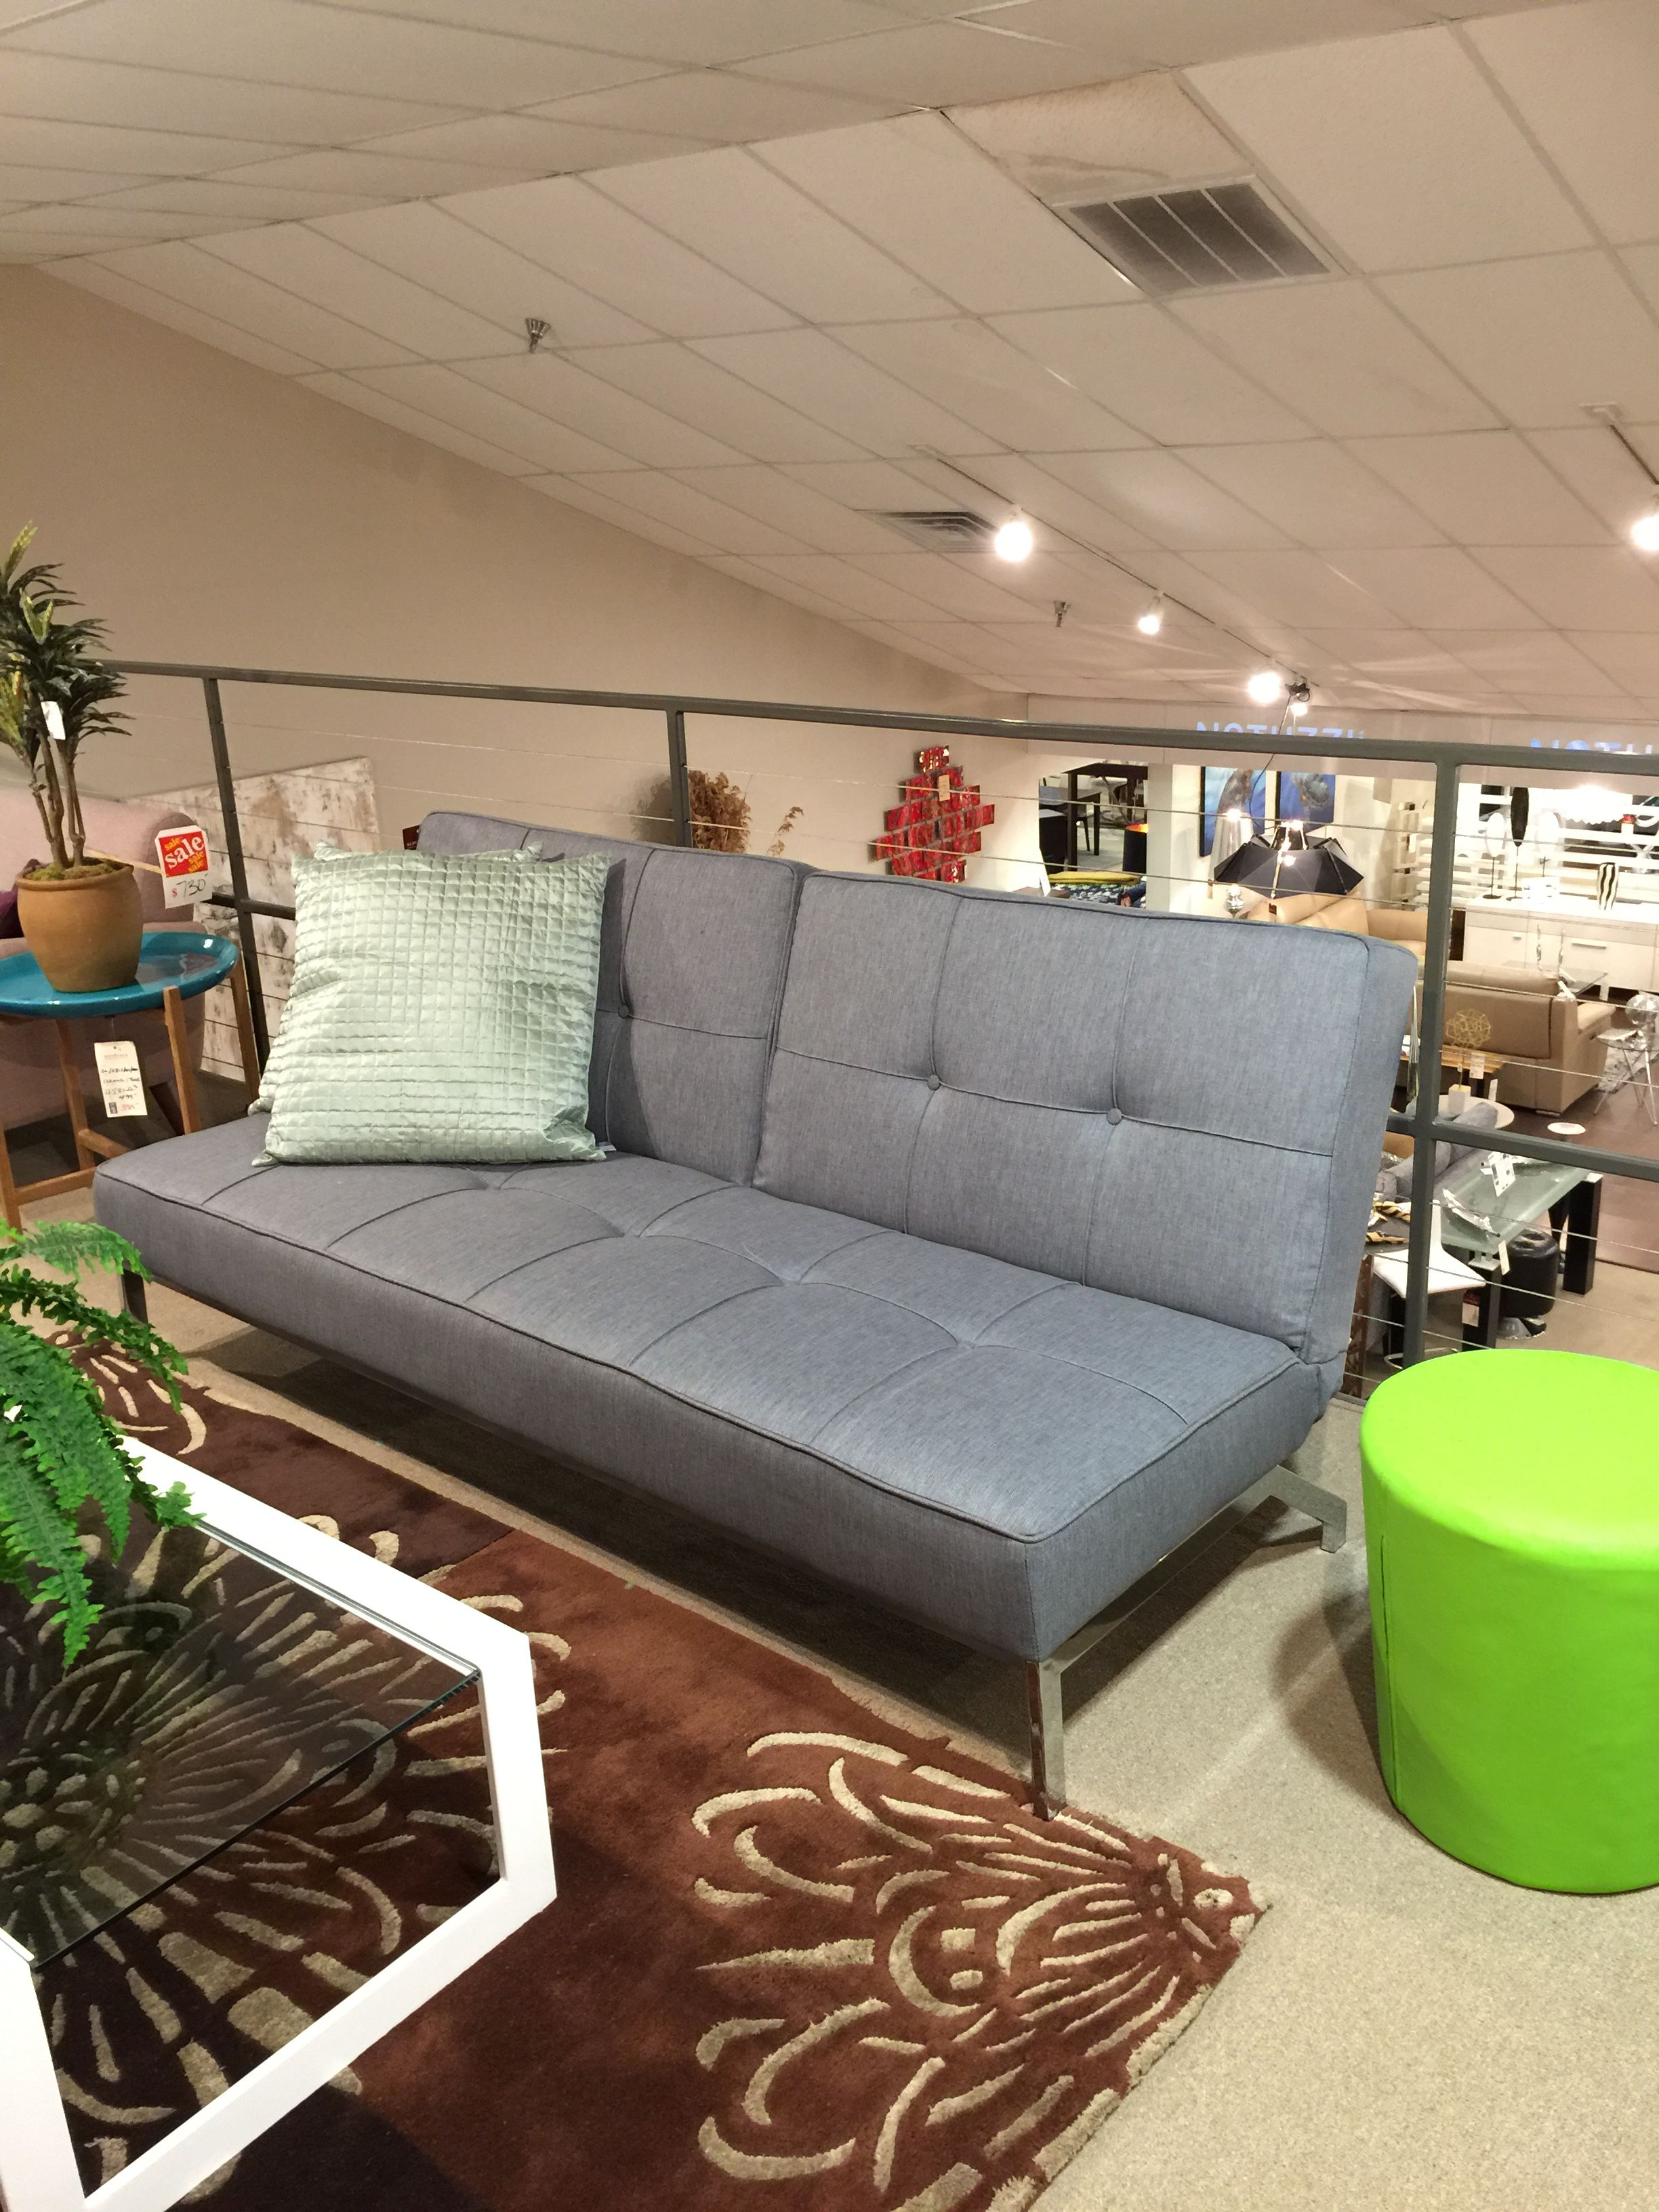 Actona perugia futon grey fabric scandinavia inc metairie new orleans louisiana contemporary modern furniture